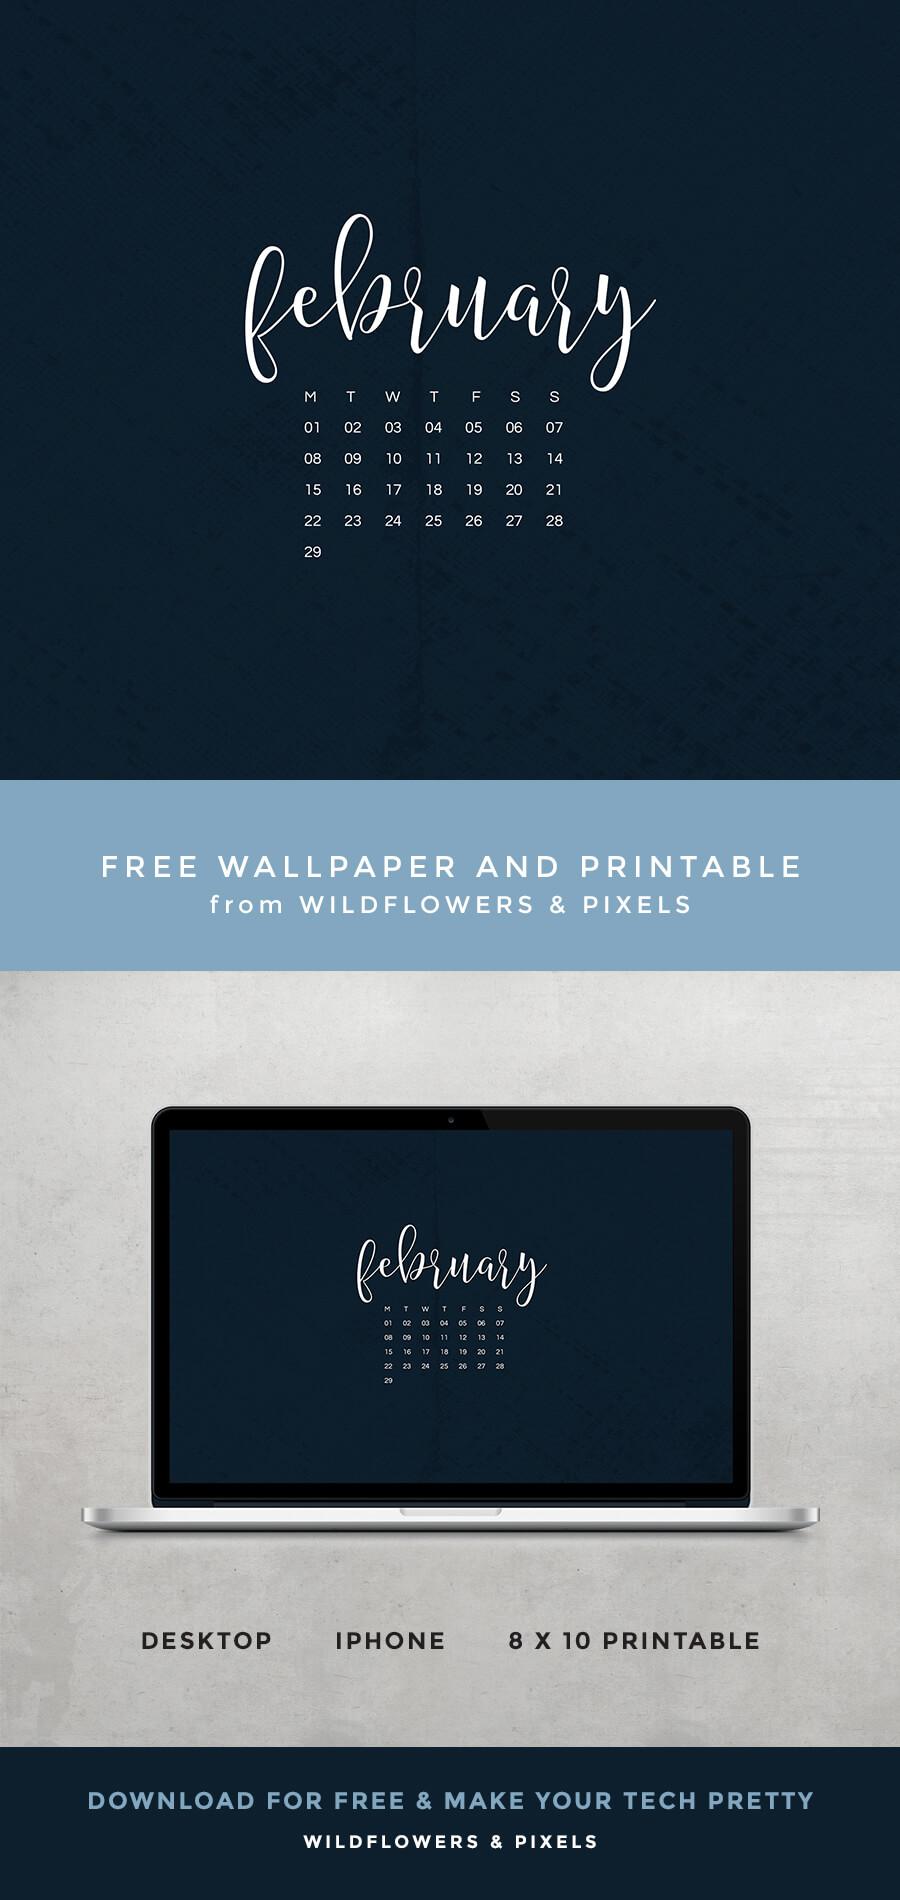 February Free Wallpaper & Printable